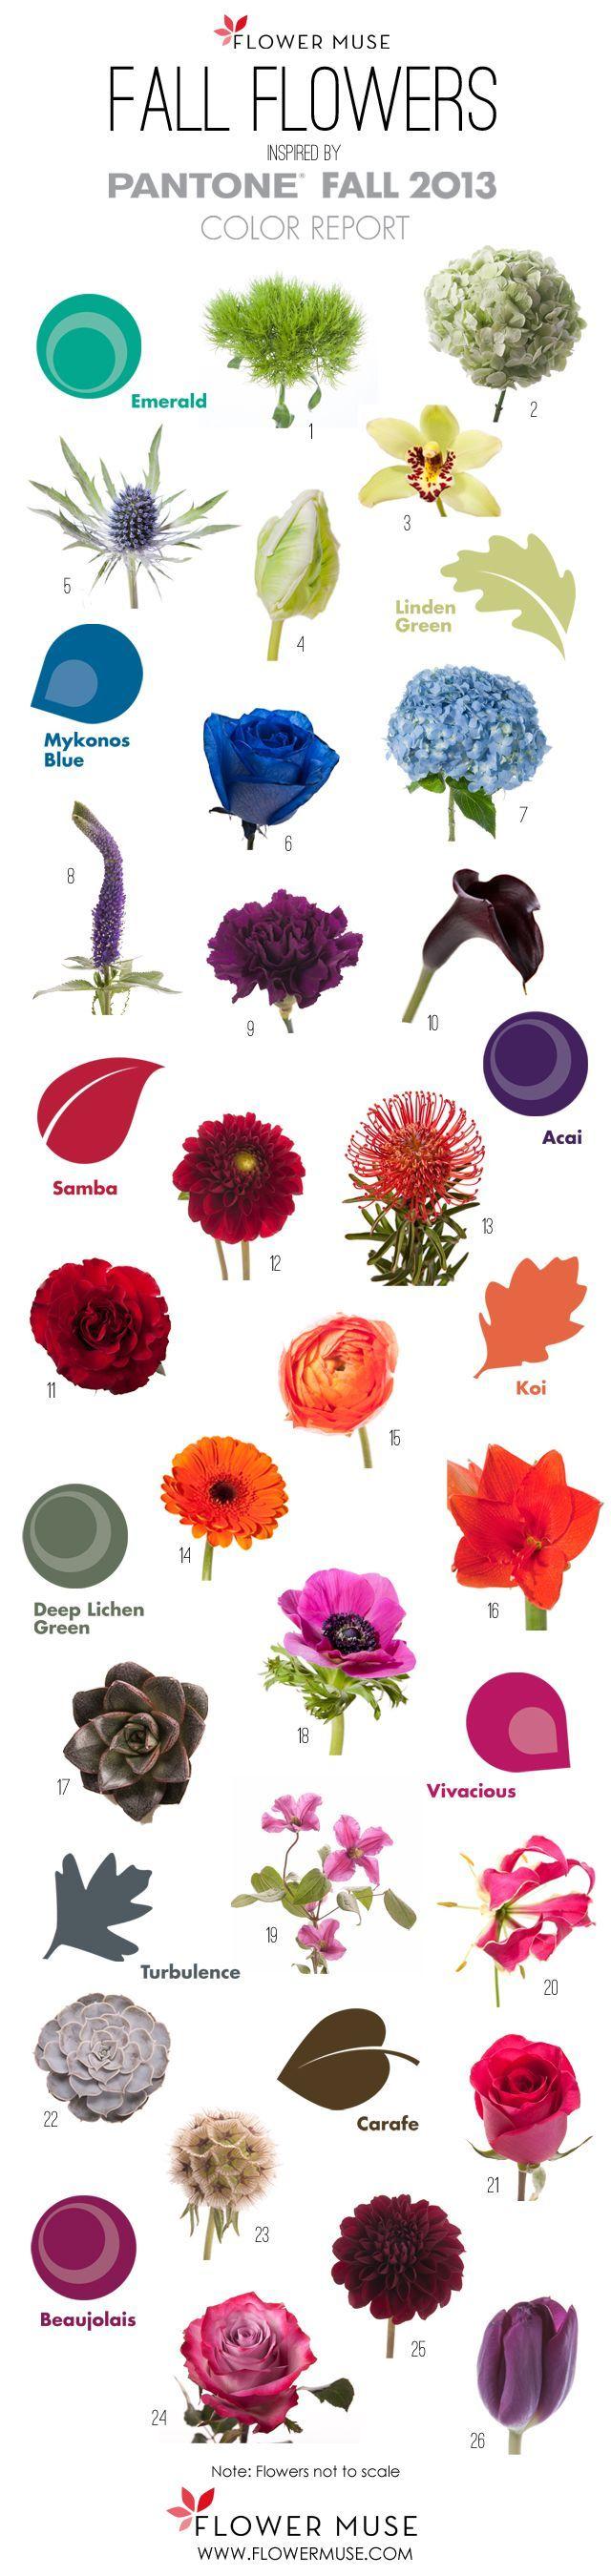 "Fall Flowers/Pantone colors❣ 1/Trick Dianthus • 2/Kiwi Hydrangea • 3/Mini Cymbidium Orchid • 4/Parrot Tulip • 5/Super Nova Thistle • 6/Dyed Rose • 7/Jumbo Hydrangea • 8/Veronica • 9/Carnation • 10/Mini Calla Lily • 11/""Hearts"" Rose • 12/Dahlia • 13/Pin Cushion Protea • 14/Germini • 15/Ranunculus • 16/Amaryllis • 17/Mini Succulent • 18/Anemone • 19/Clematis • 20/Gloriosa Lily •"